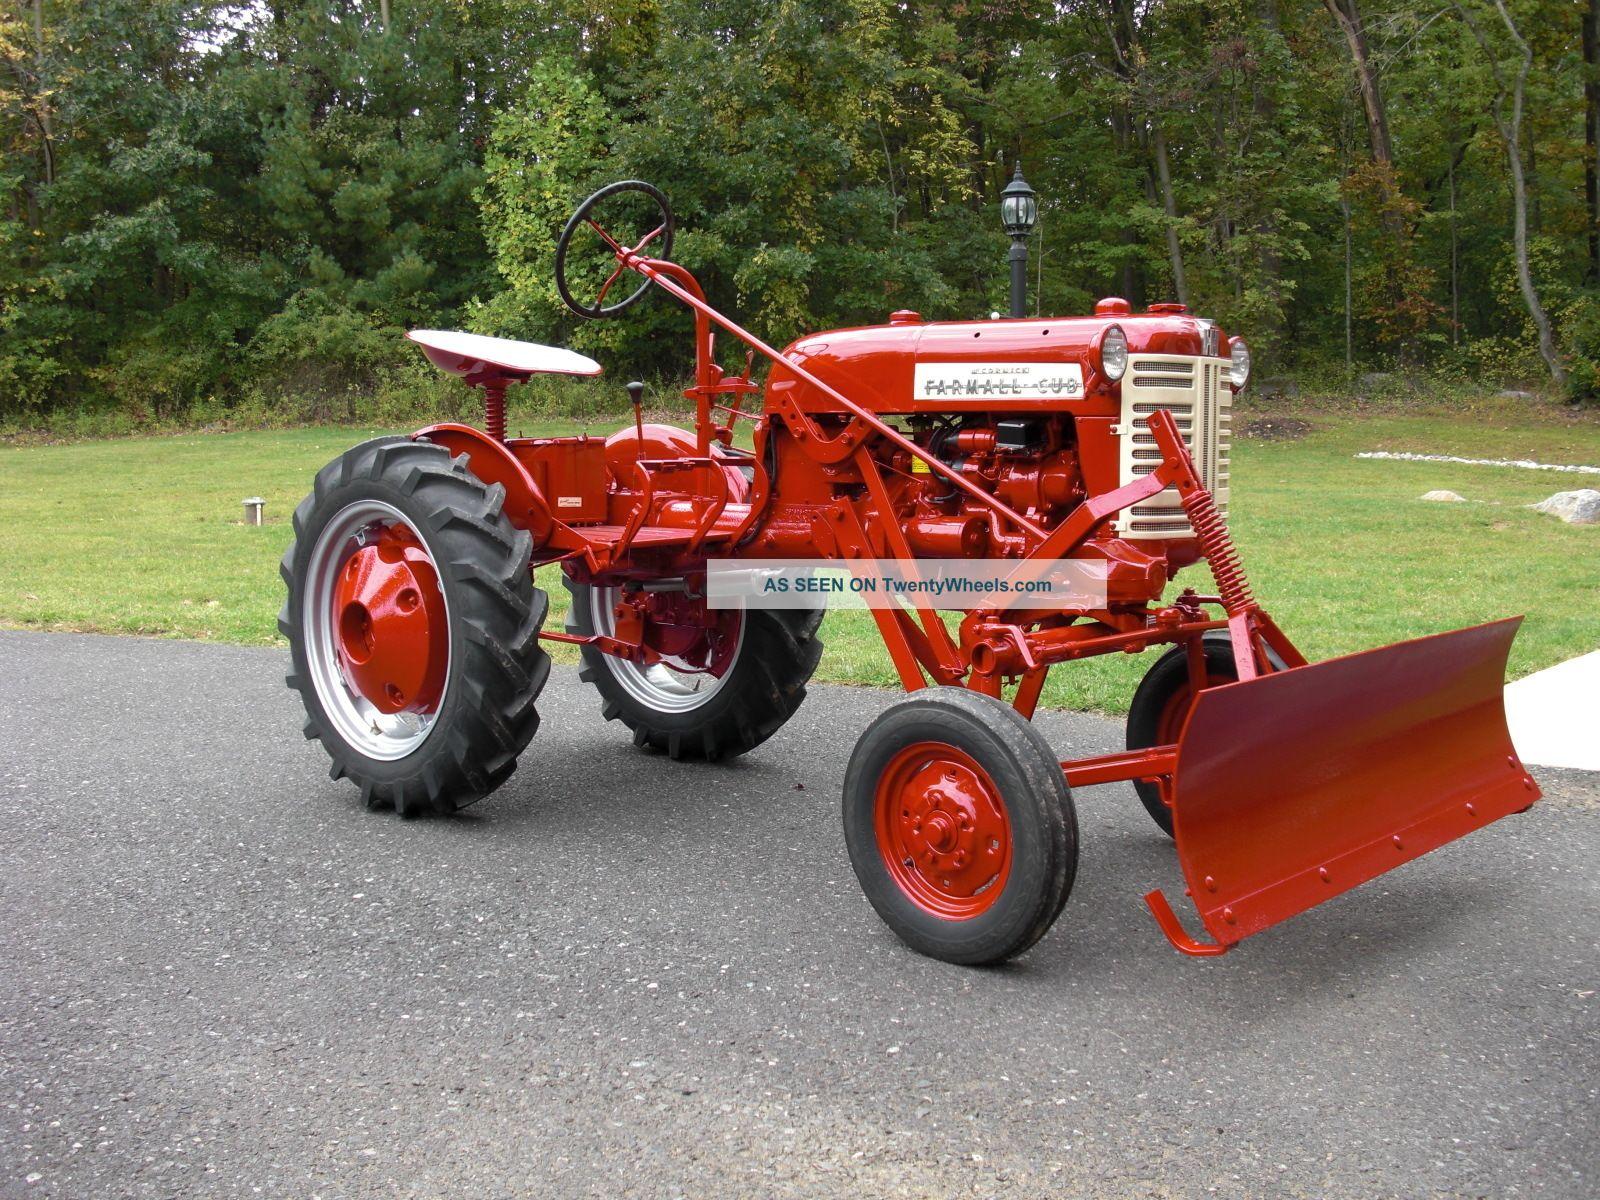 Restored Ih Tractors : Farmall cub tractor restored